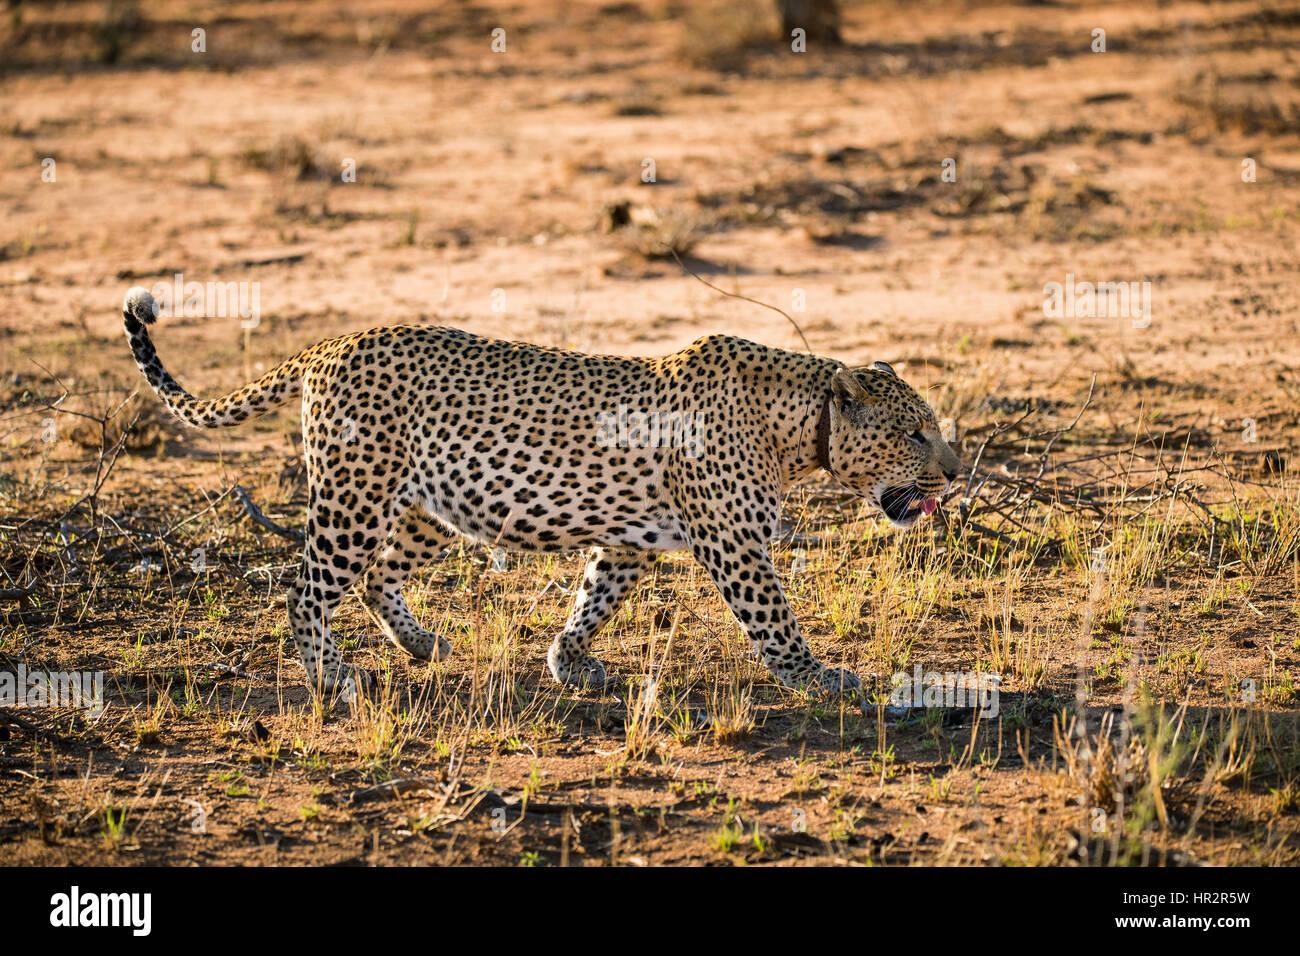 Leopard tragen Tracking collar, Panthera Pardus, Okonjima, Namibia, Afrika, von Monika Hrdinova/Dembinsky Foto Assoc Stockfoto